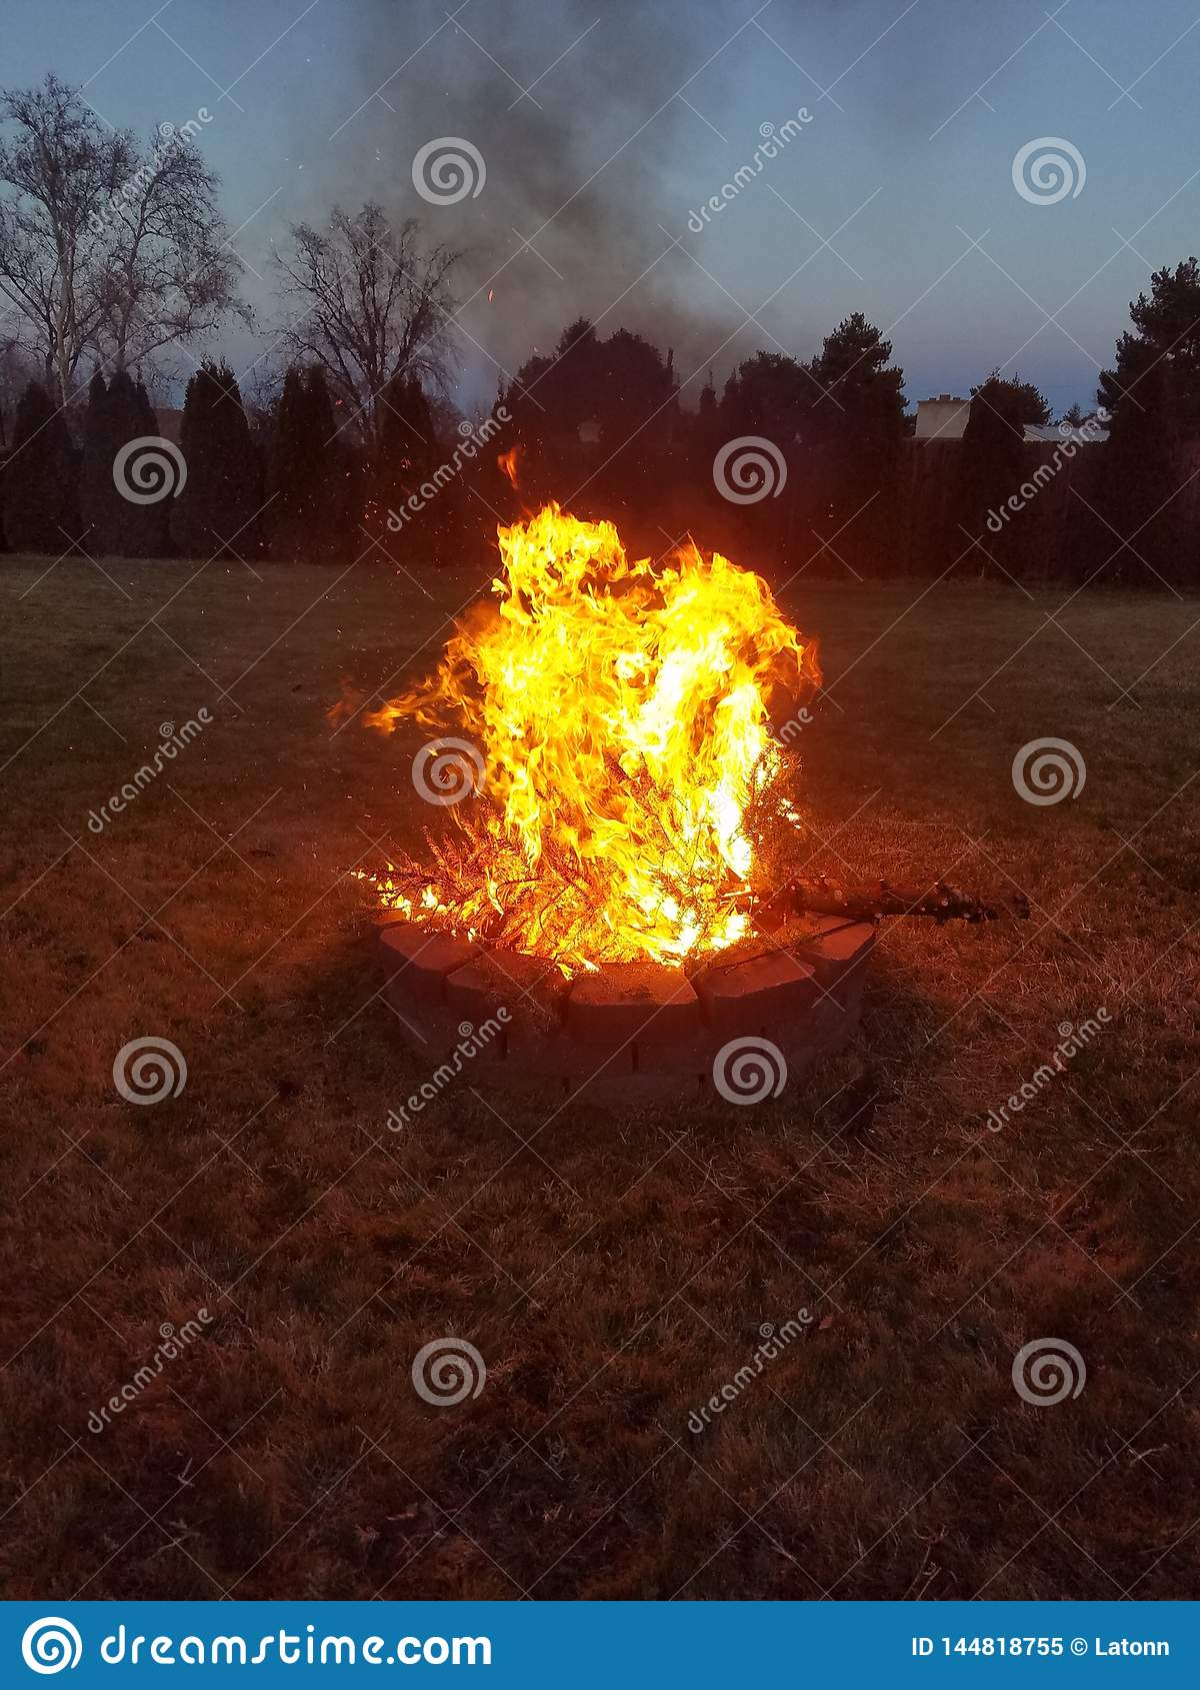 Burning the Christmas Tree of 2018